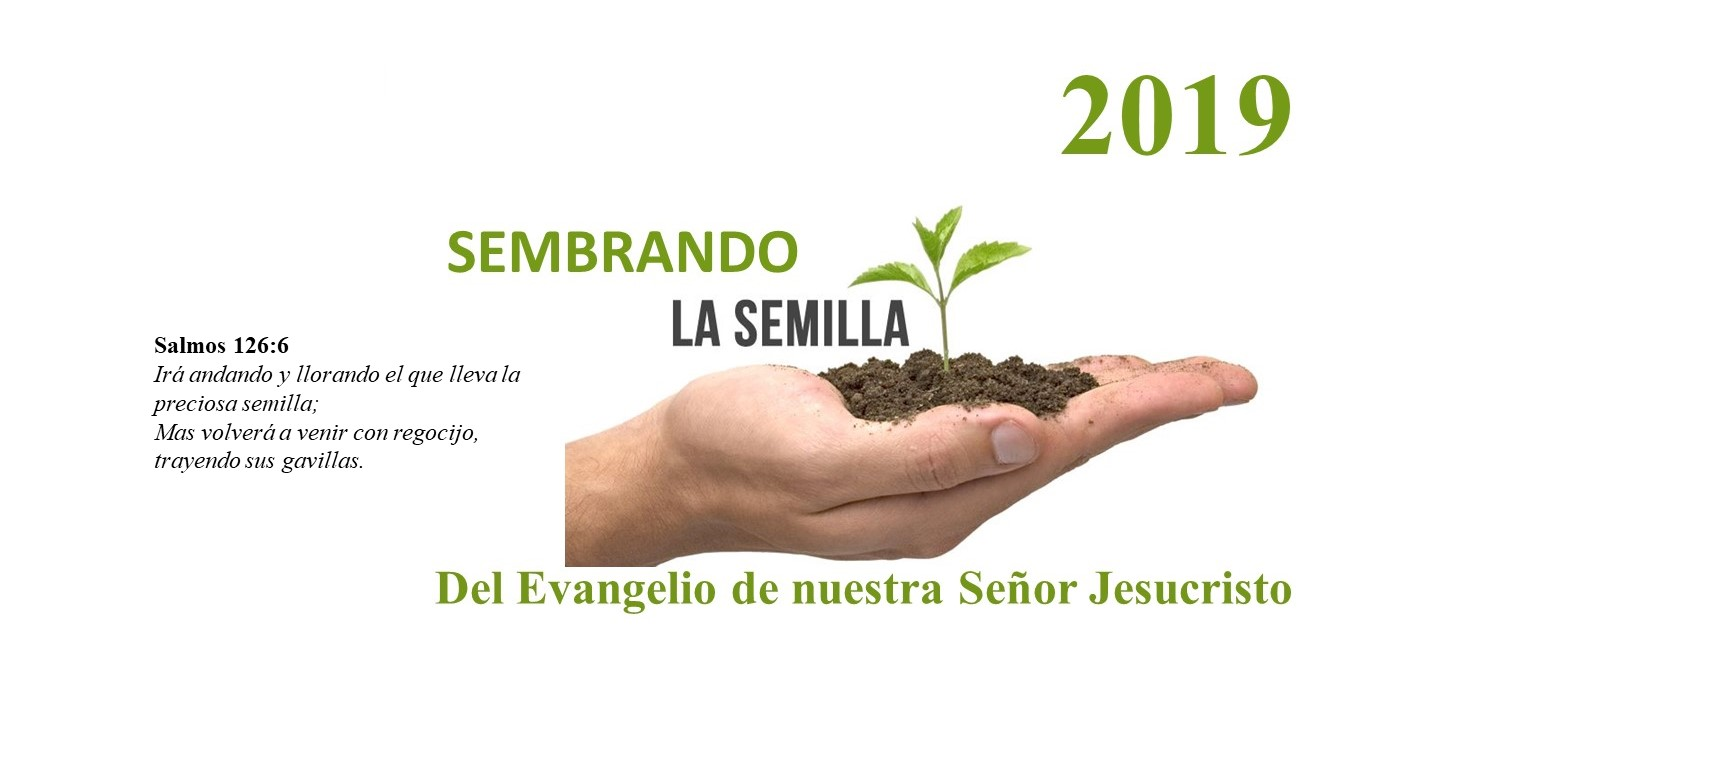 IBE website Tema 2019